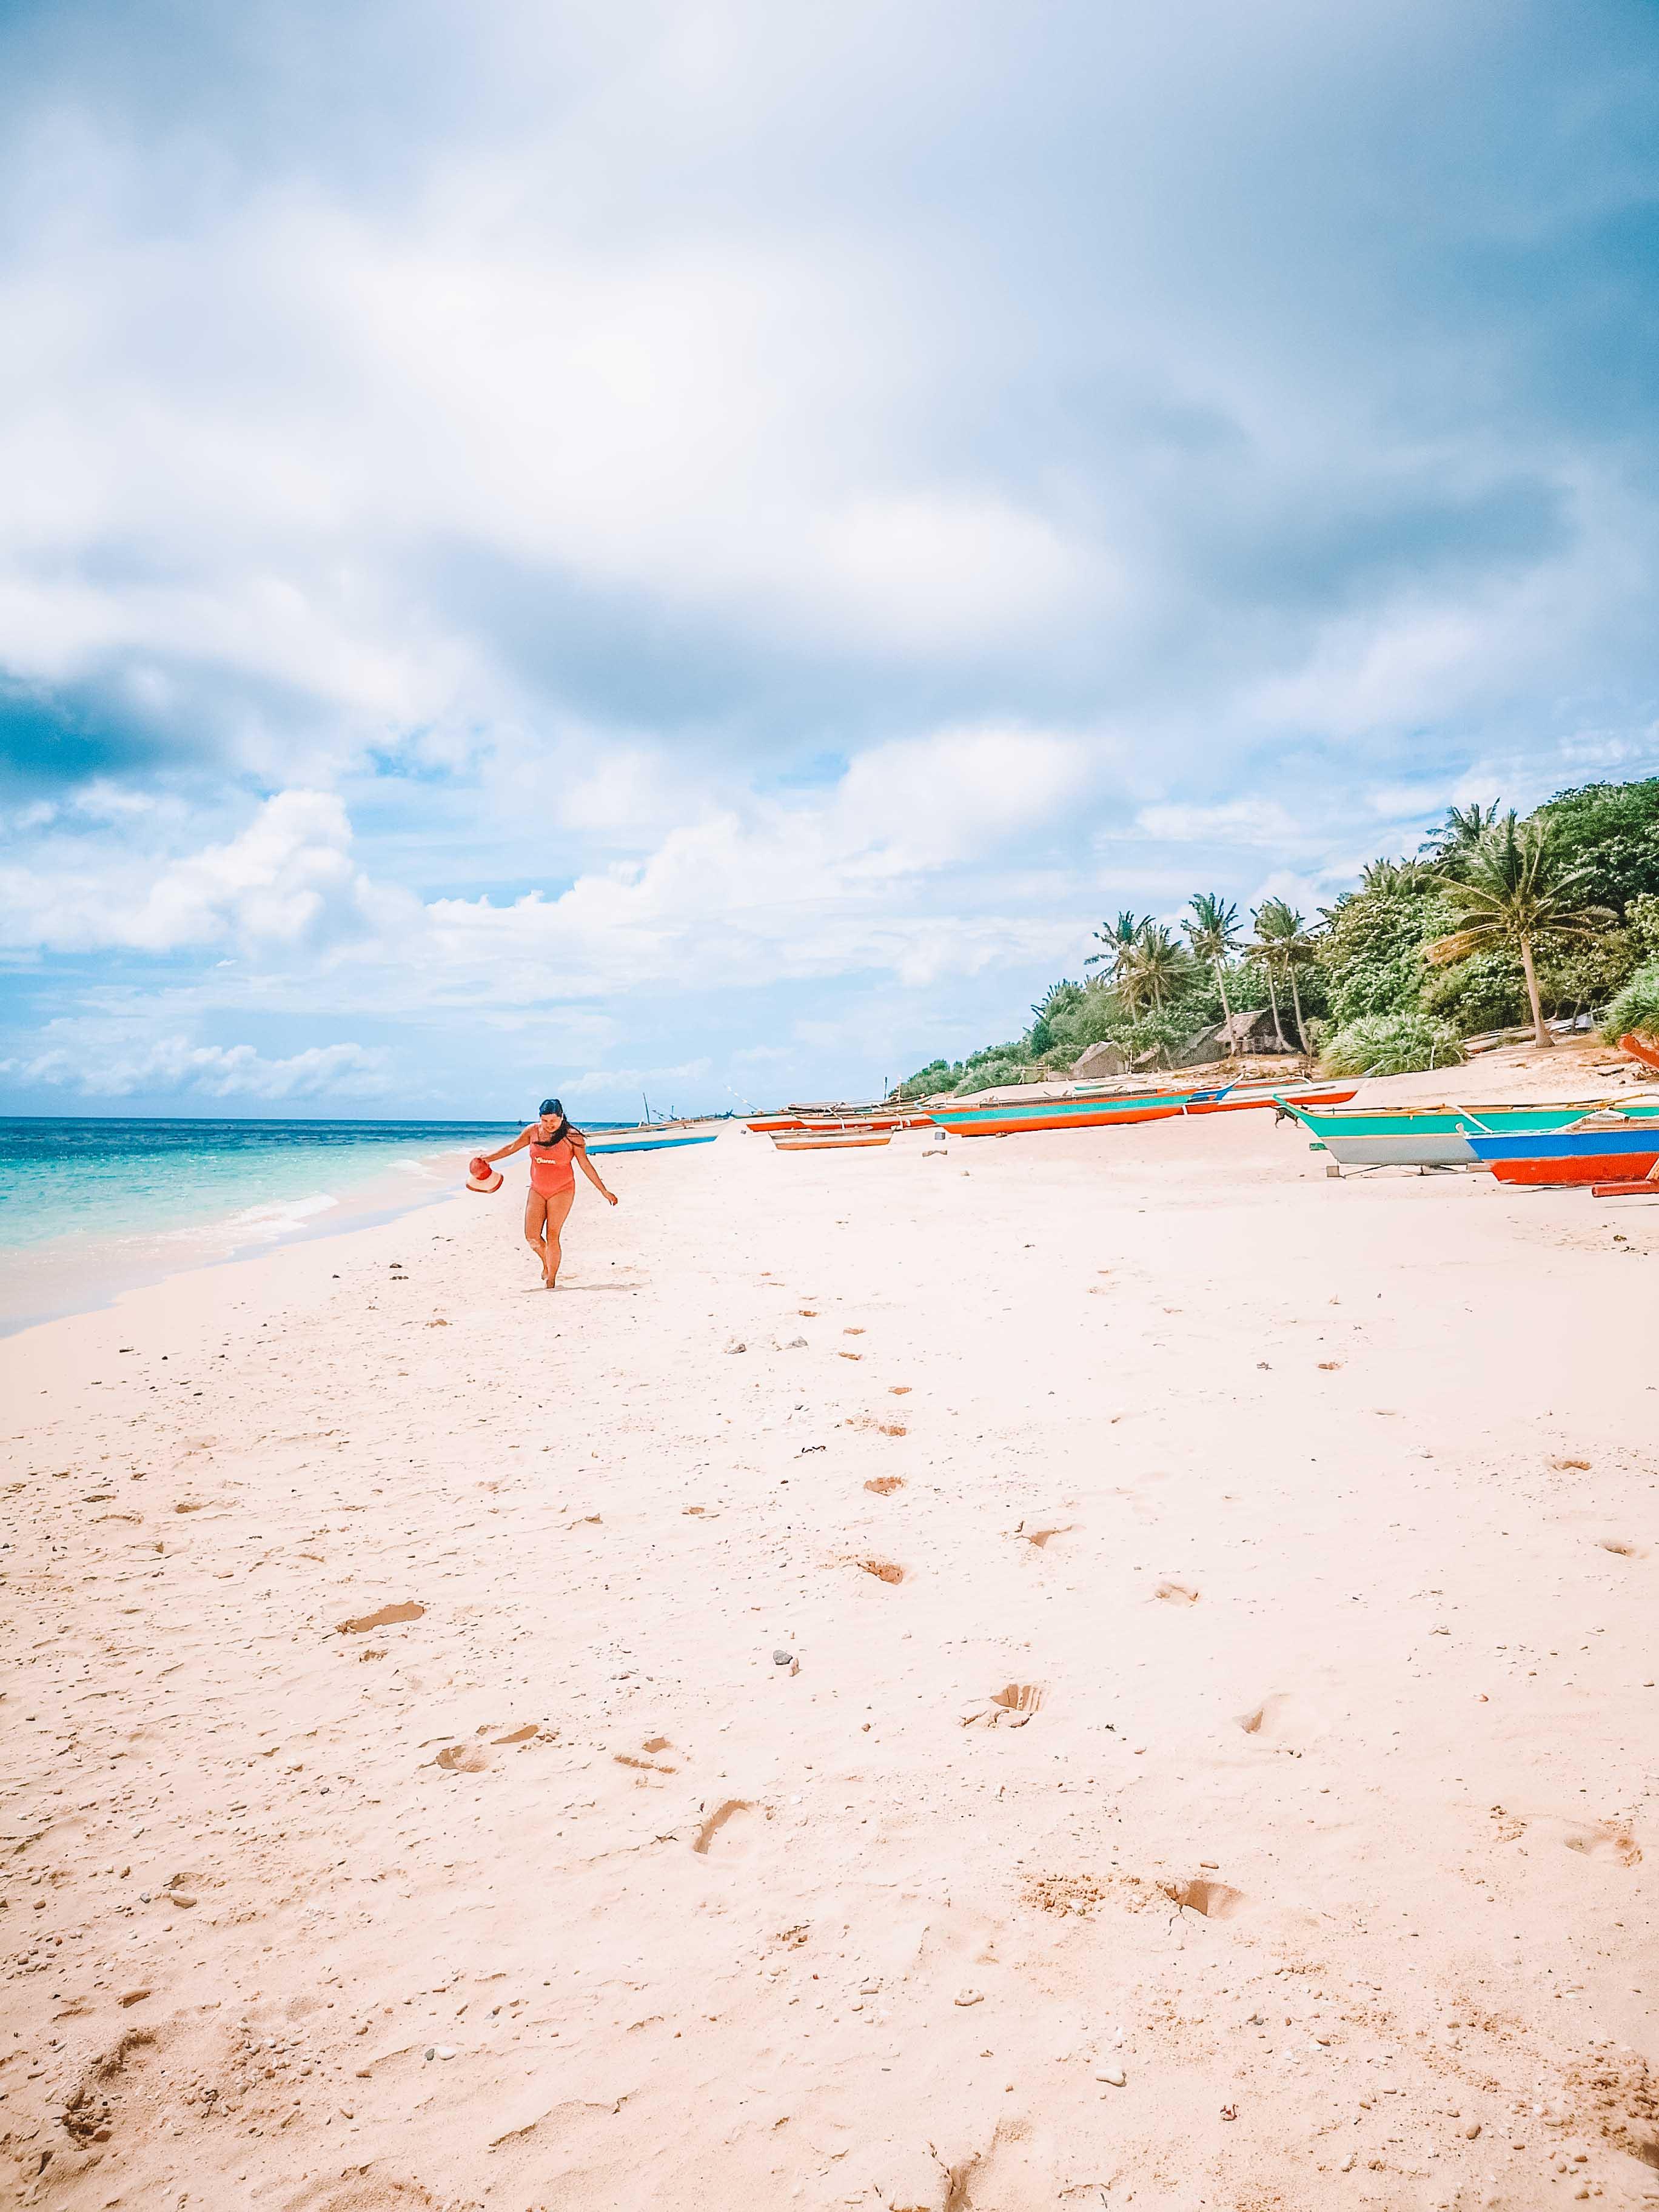 Macolabo Beach Camarines Norte